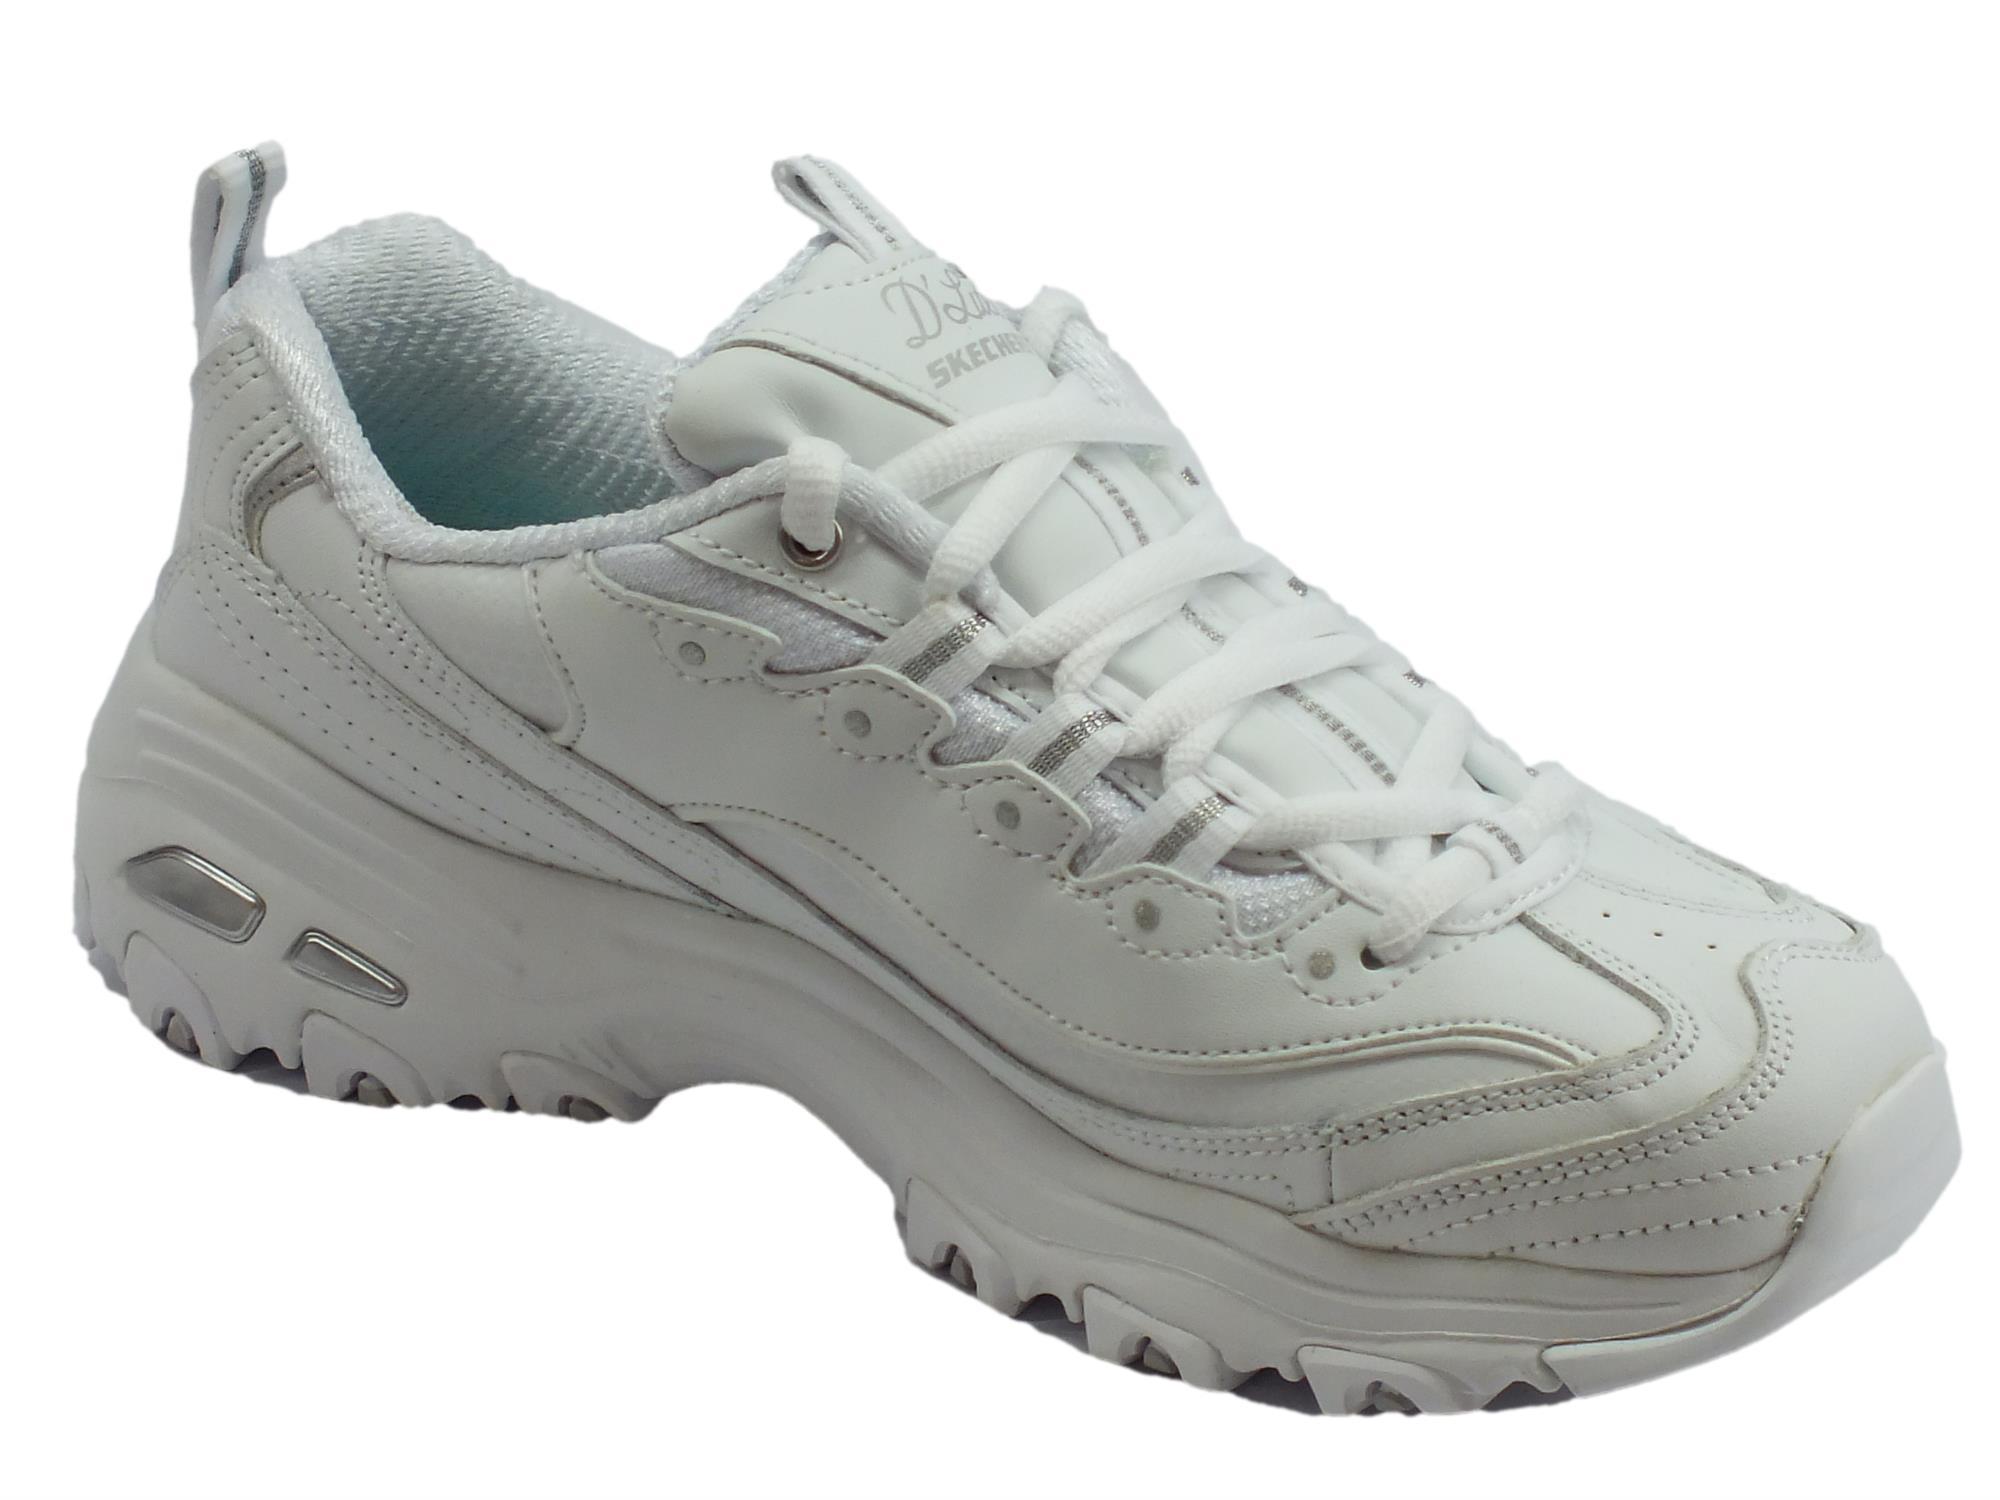 Skechers D'Lites Fresh Start White Silver Sportive per donna memory foam